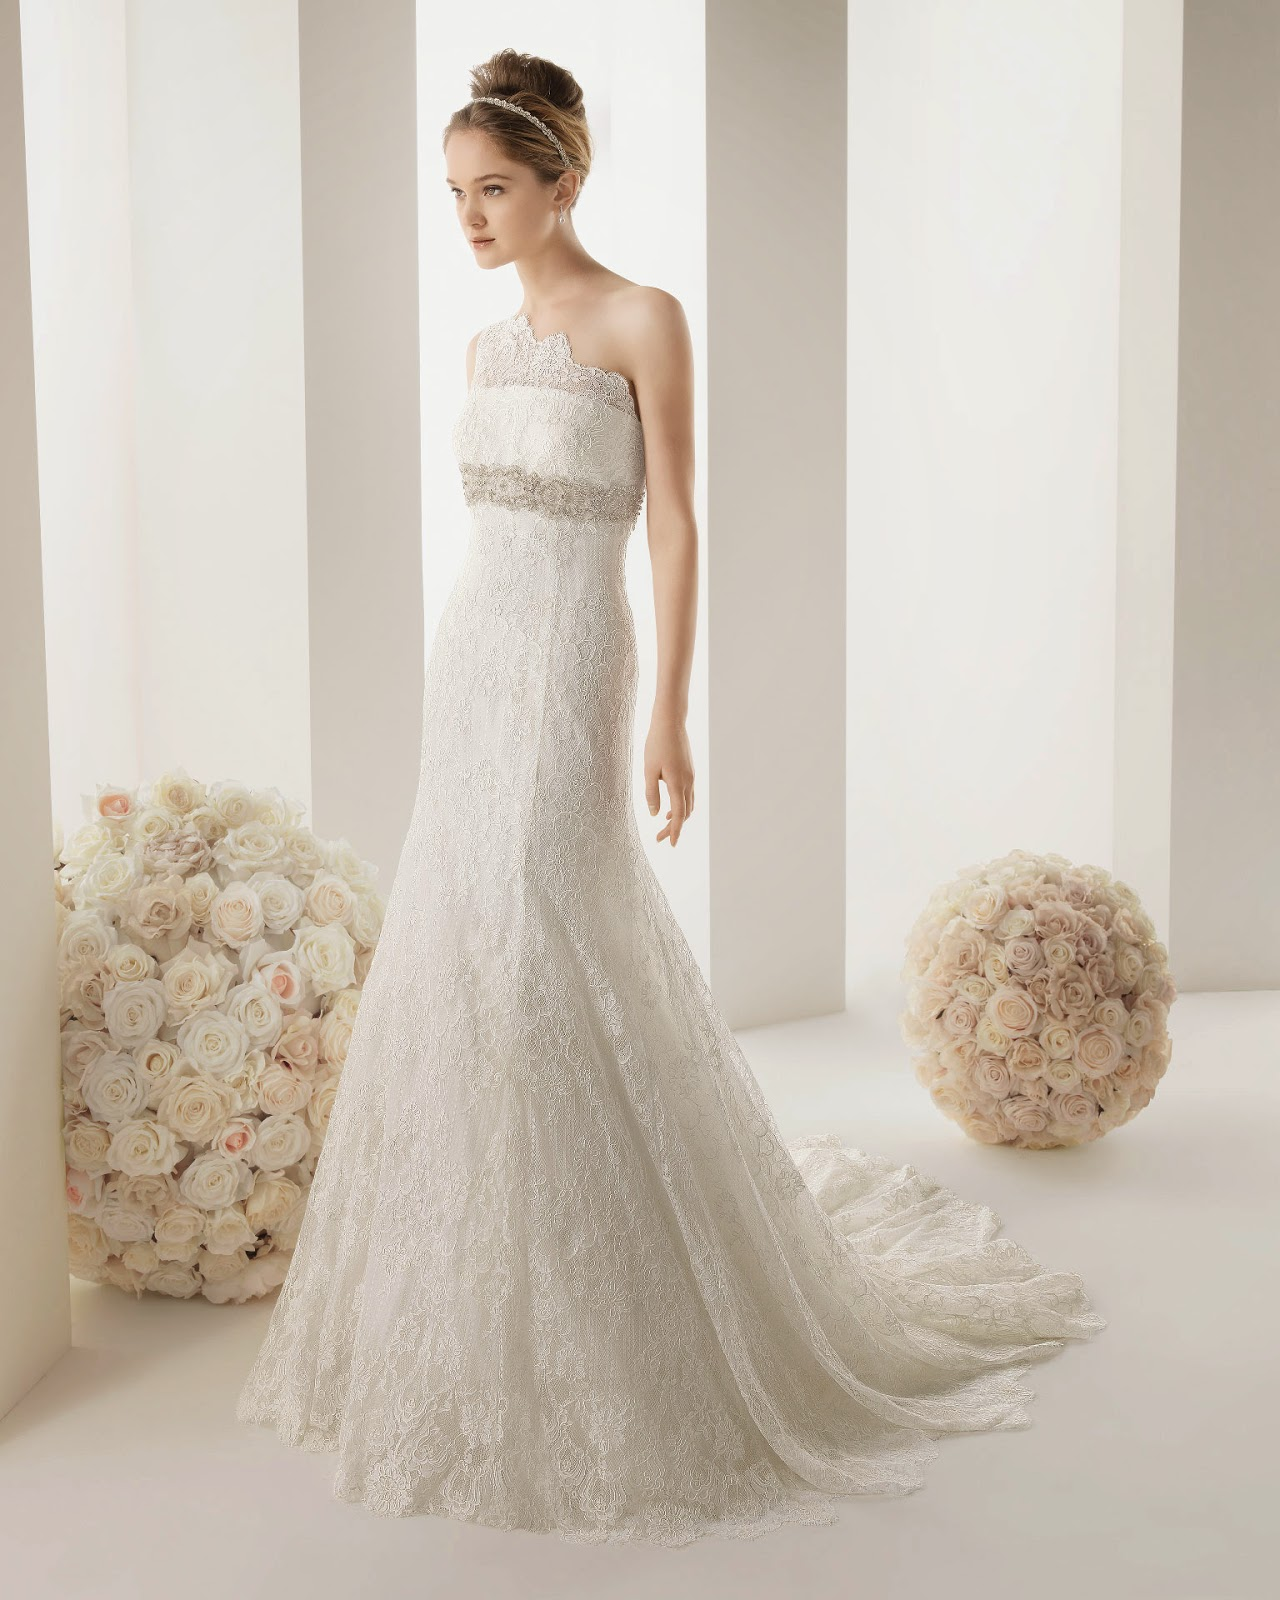 Wedding Dress Rental Malaysia Price - Expensive Wedding Dresses Online